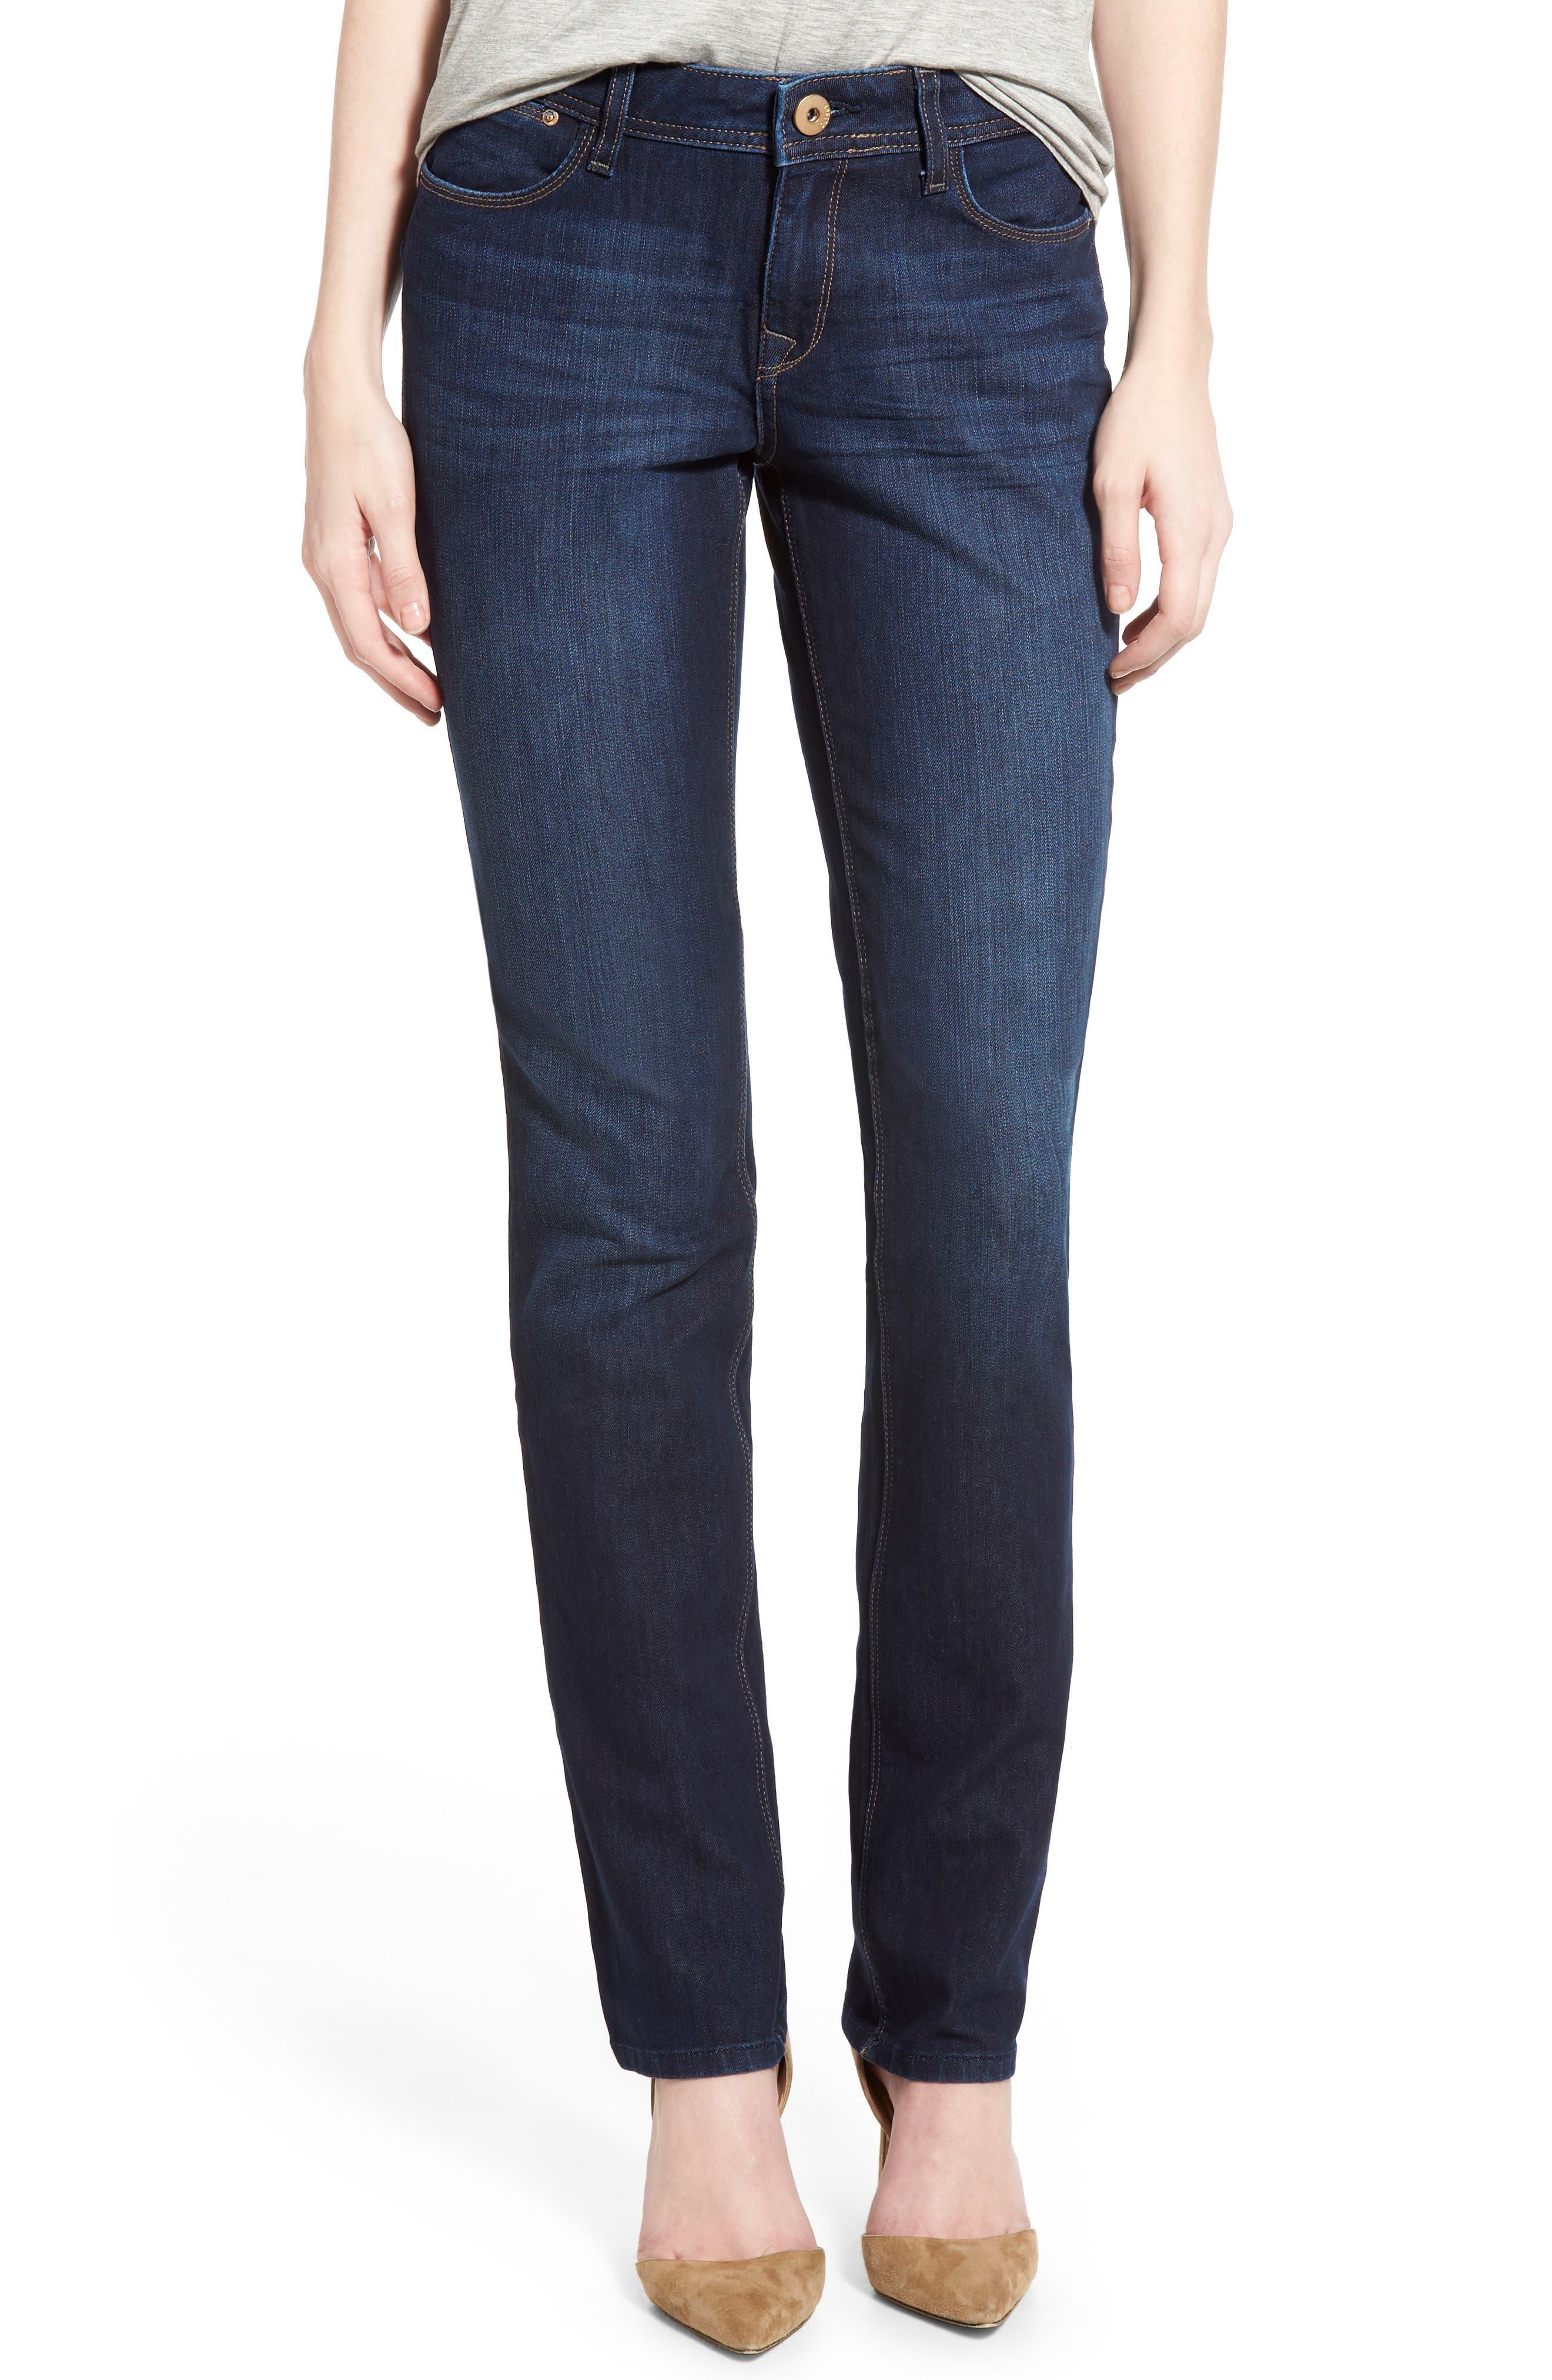 DL1961 Womens Coco Curvy Slim Straight Jeans